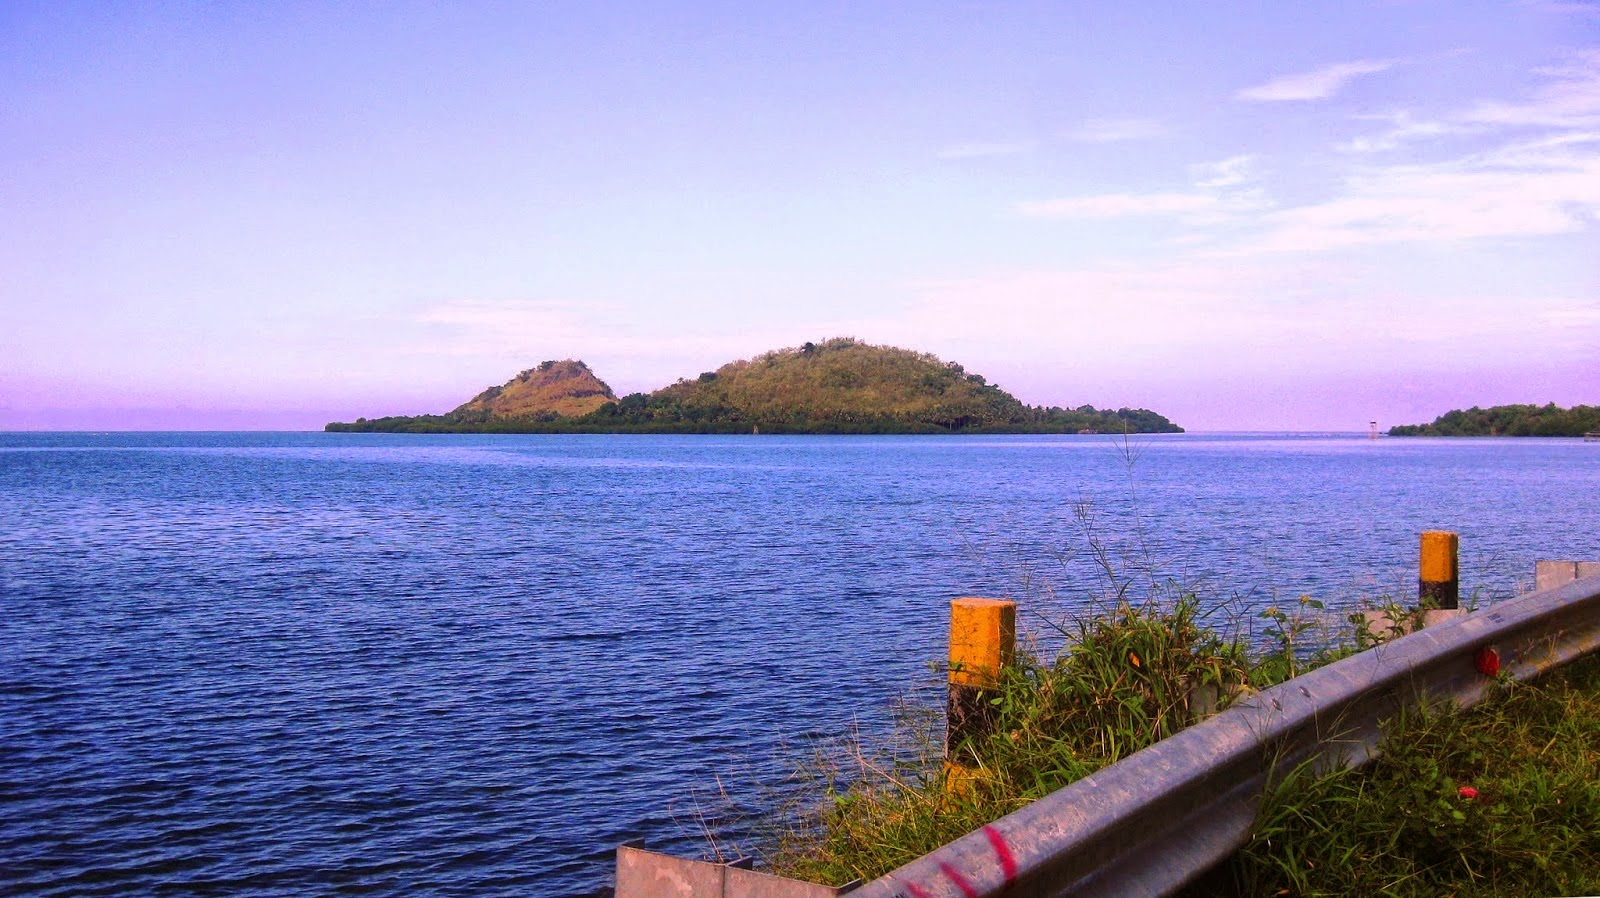 Kebudayaan Kepariwisataan Polewali Mandar Wisata Maritim Gugusan Pulau Nampak Depan